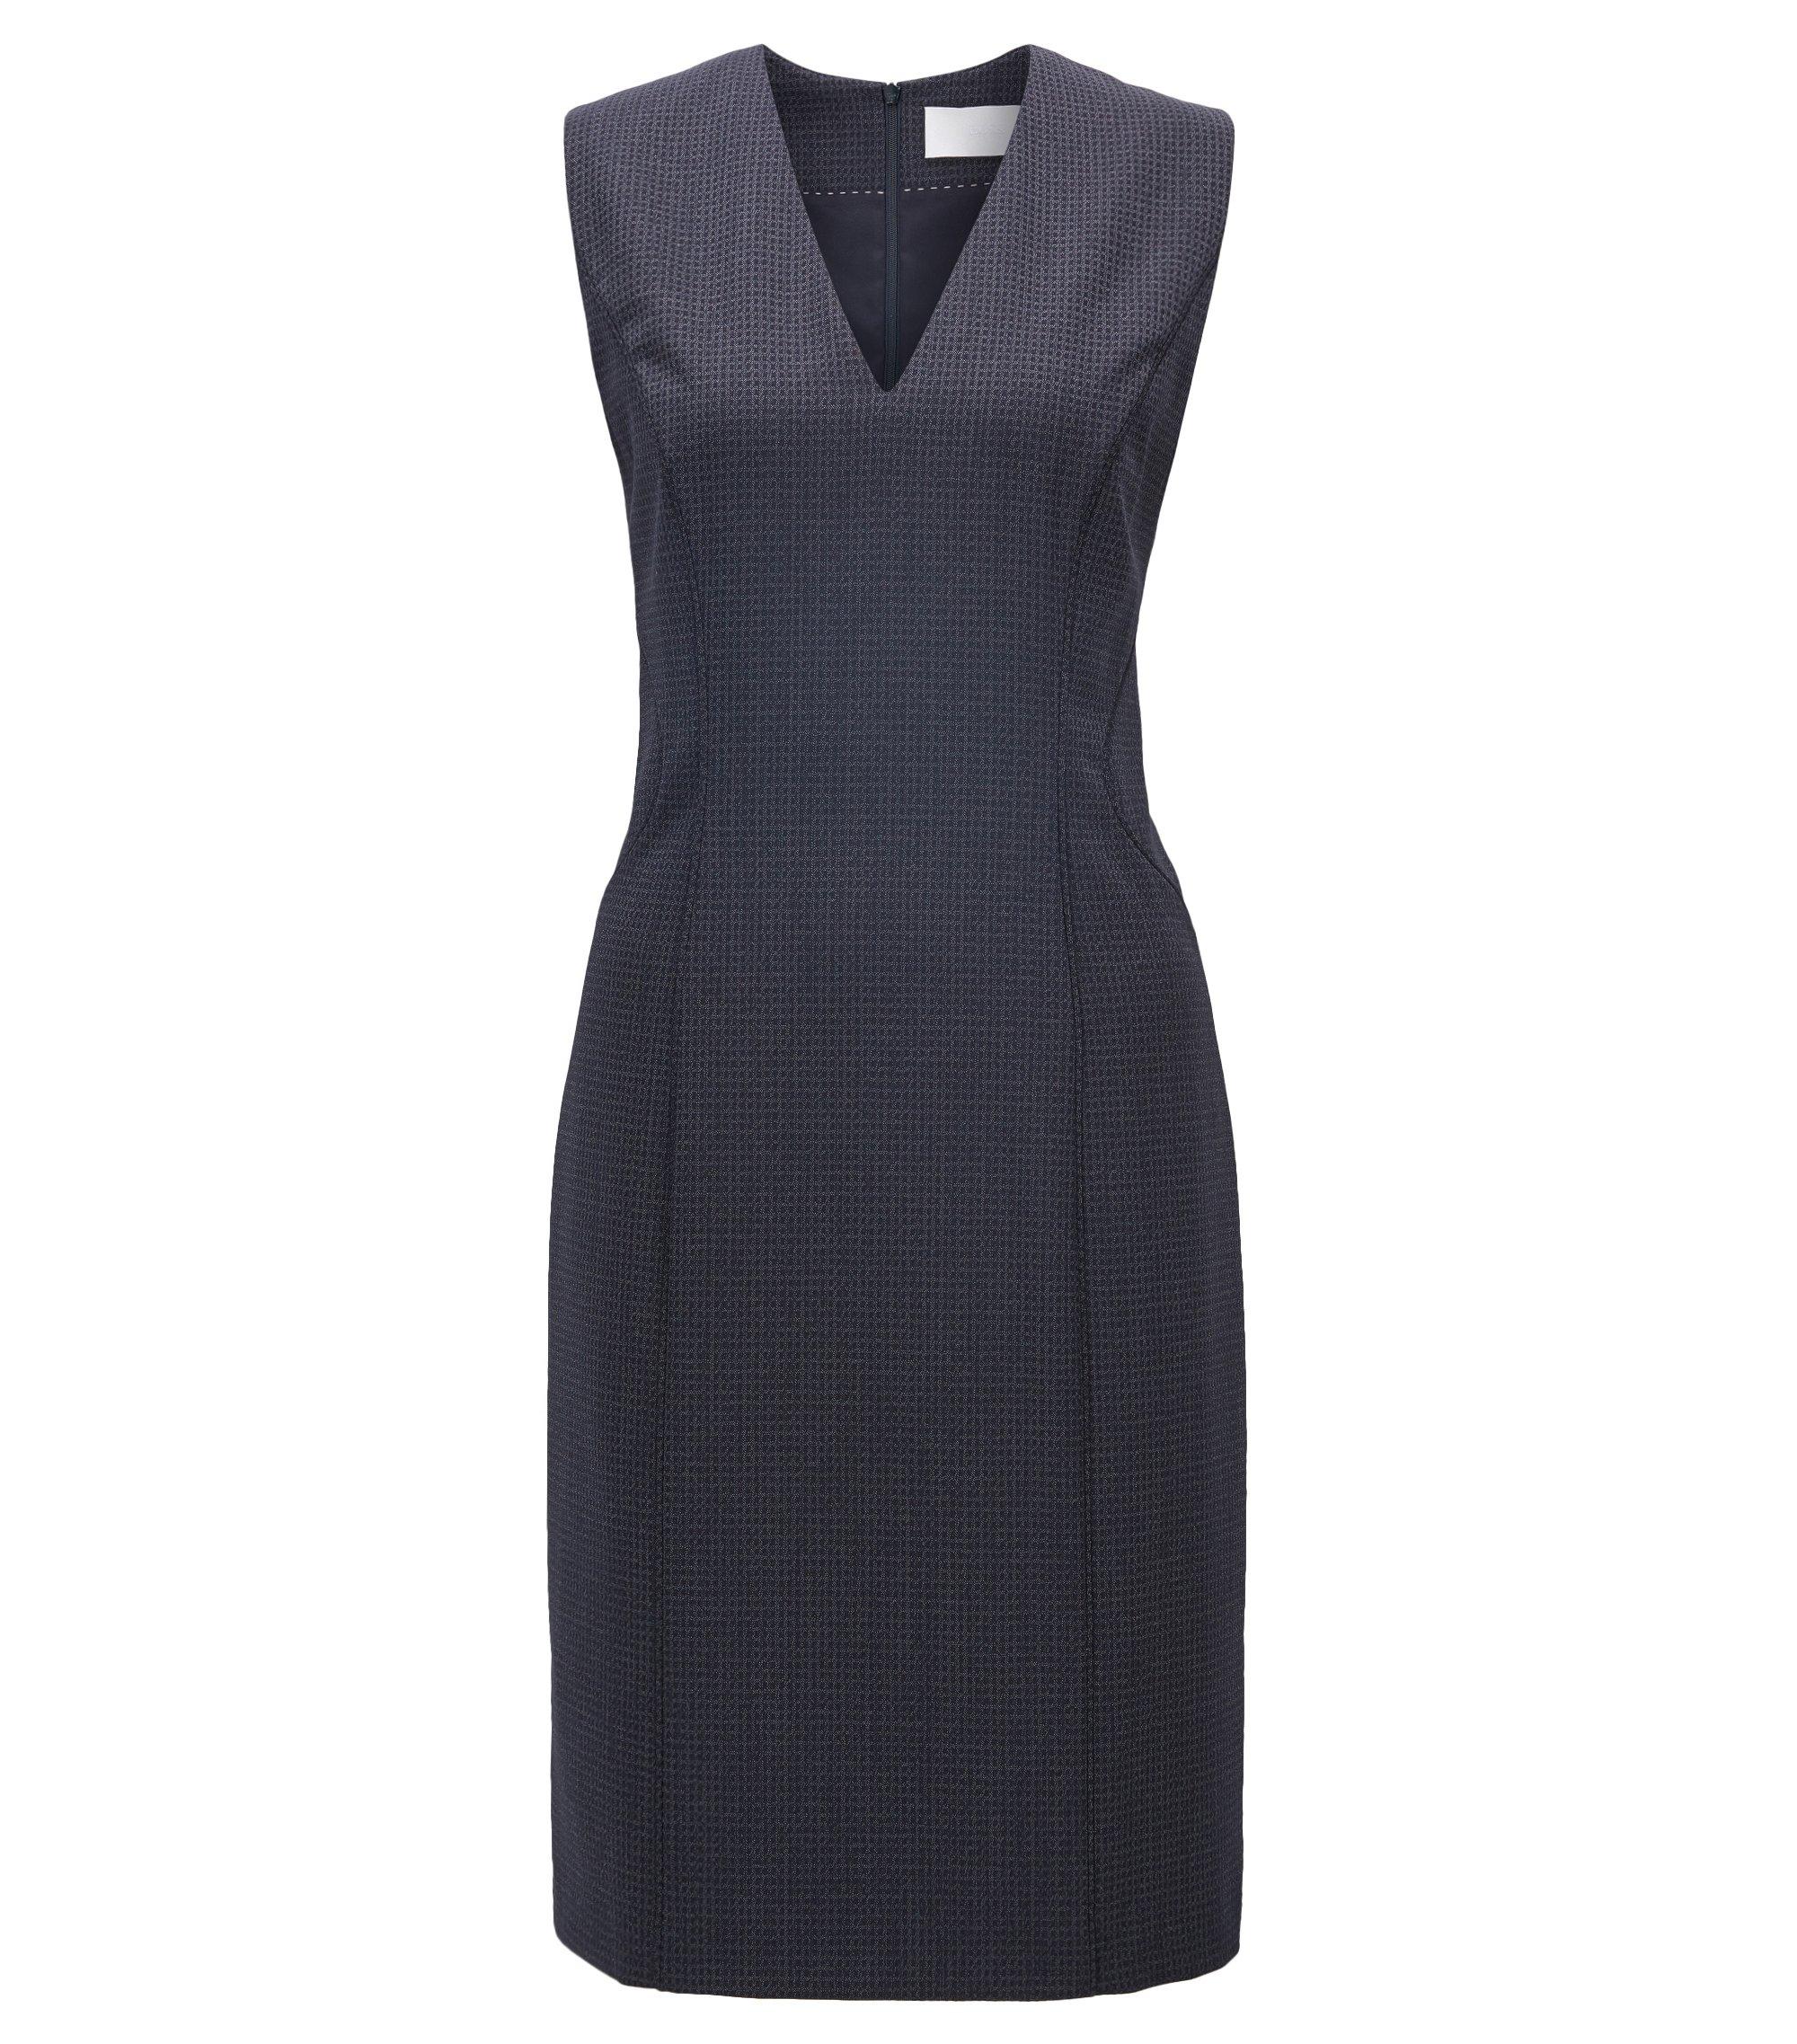 Square-Print Stretch Virgin Wool-Silk Sheath Dress | Dukani, Patterned